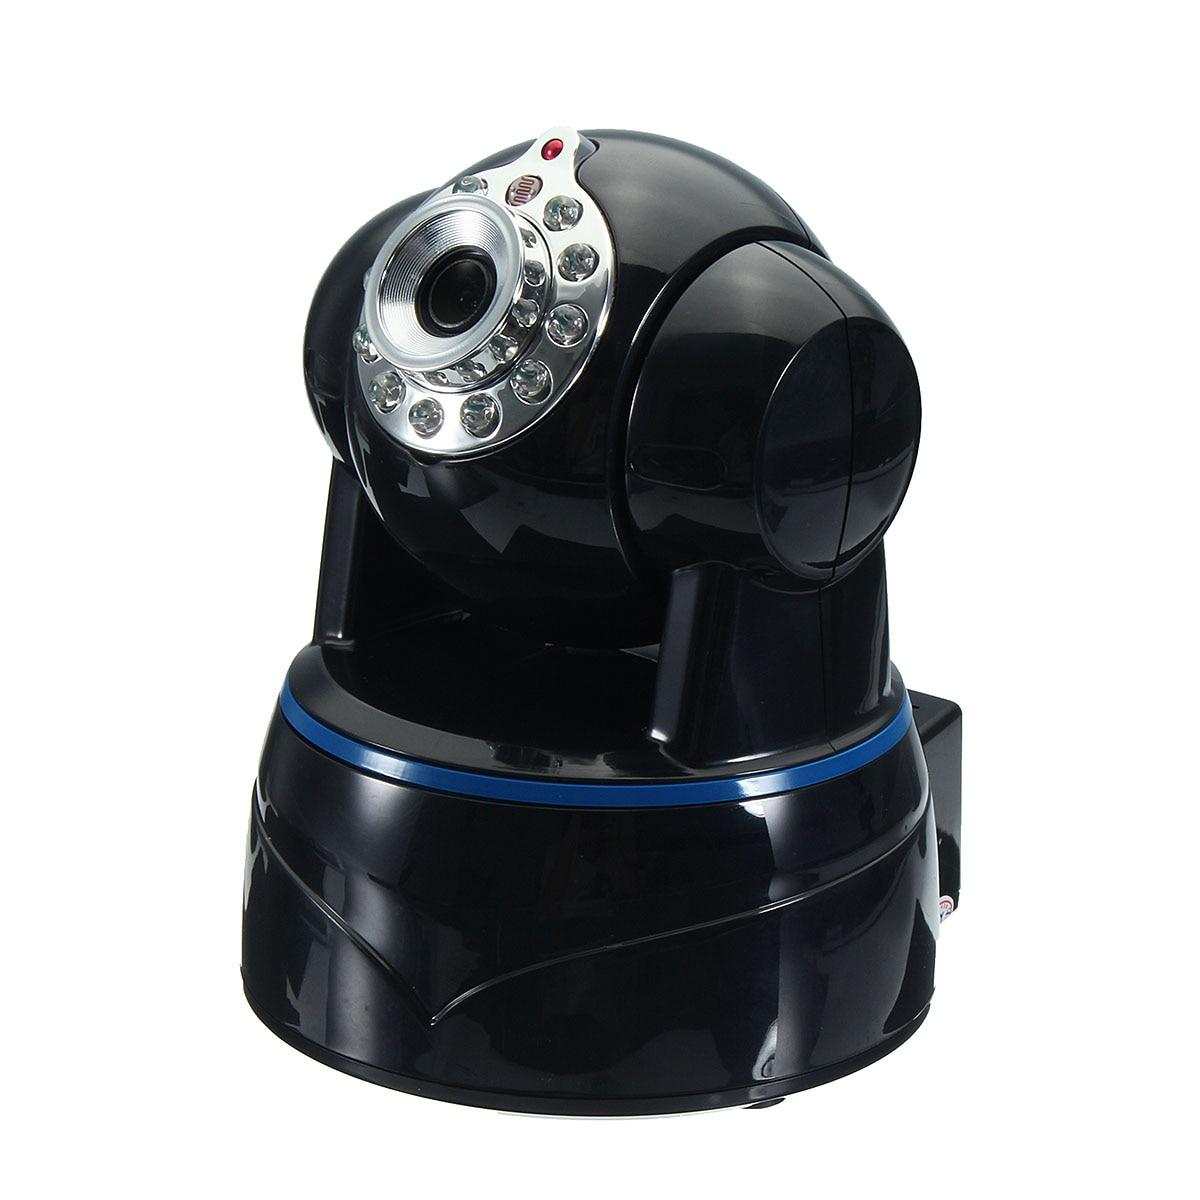 Safurance Wireless 1080P Pan Tilt Network Security CCTV IP Camera Night Vision WiFi Webcam Home Safety Surveillance high quality wireless pan tilt 720p security network cctv ip camera wifi webcam with different accessories